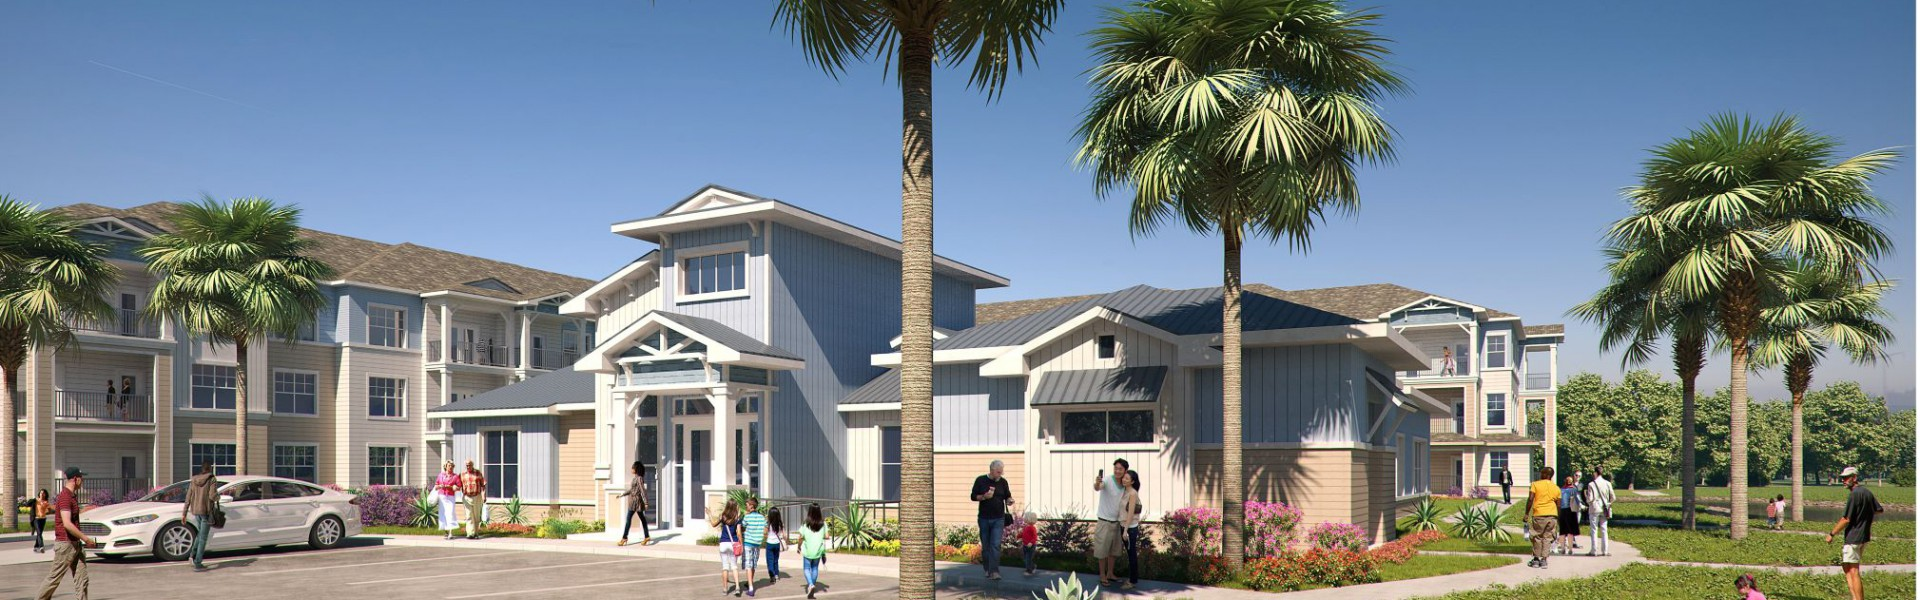 Palladium Port Aransas - Occupancy Spring 2022!